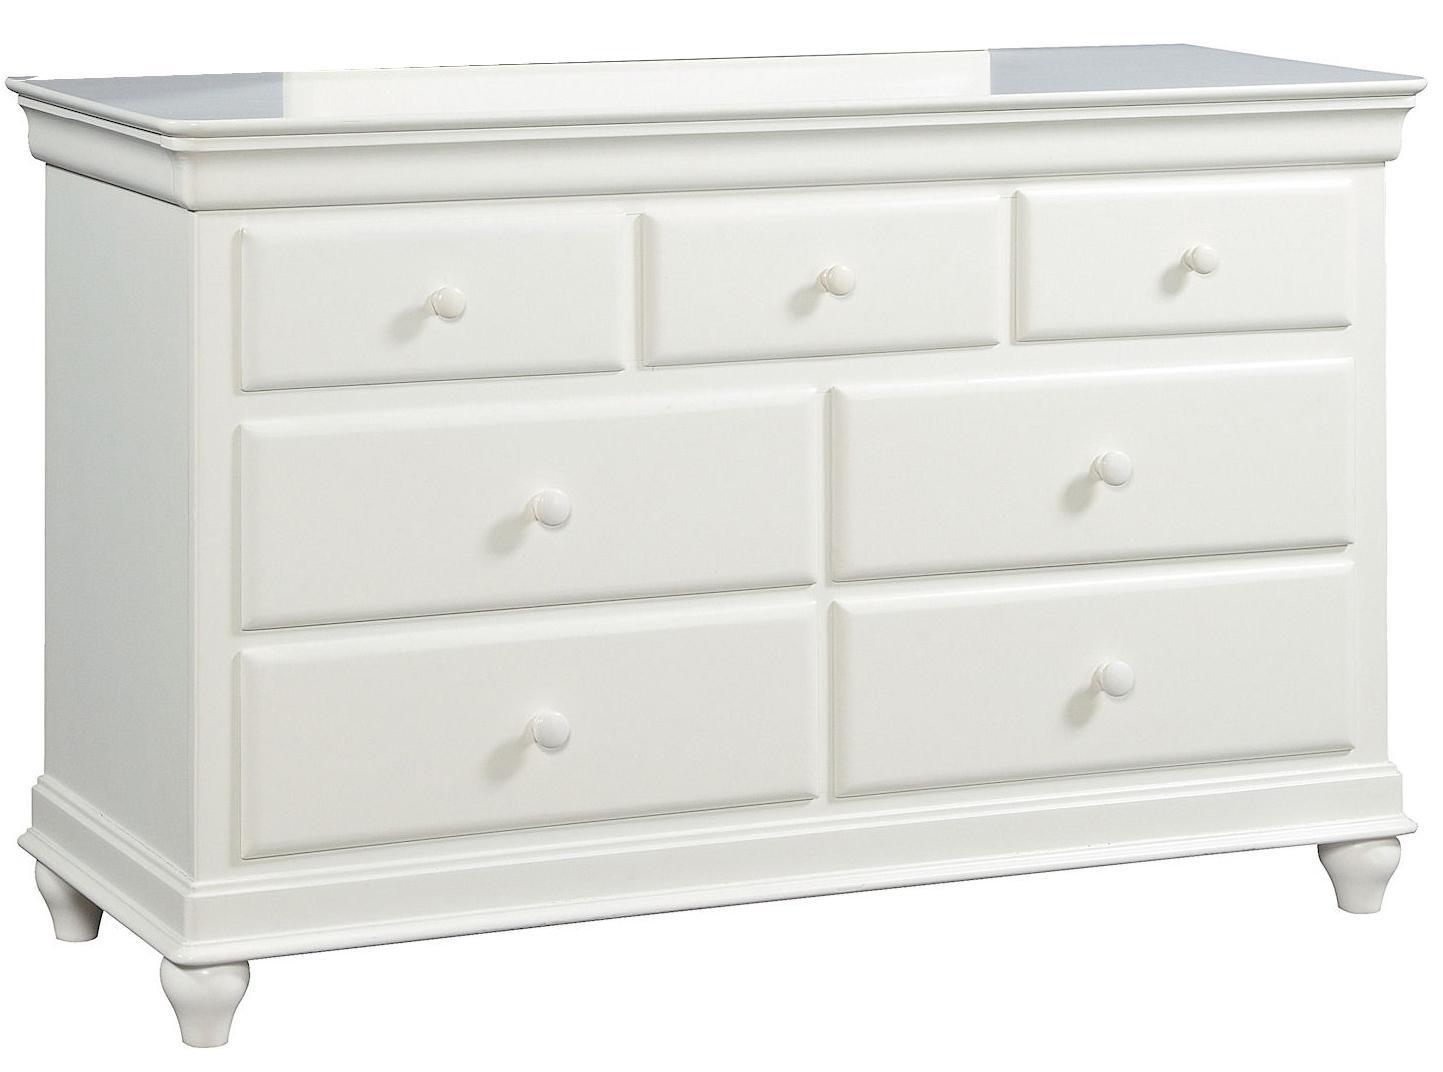 Smartstuff Classics 4.0 Drawer Dresser - Item Number: 131A002